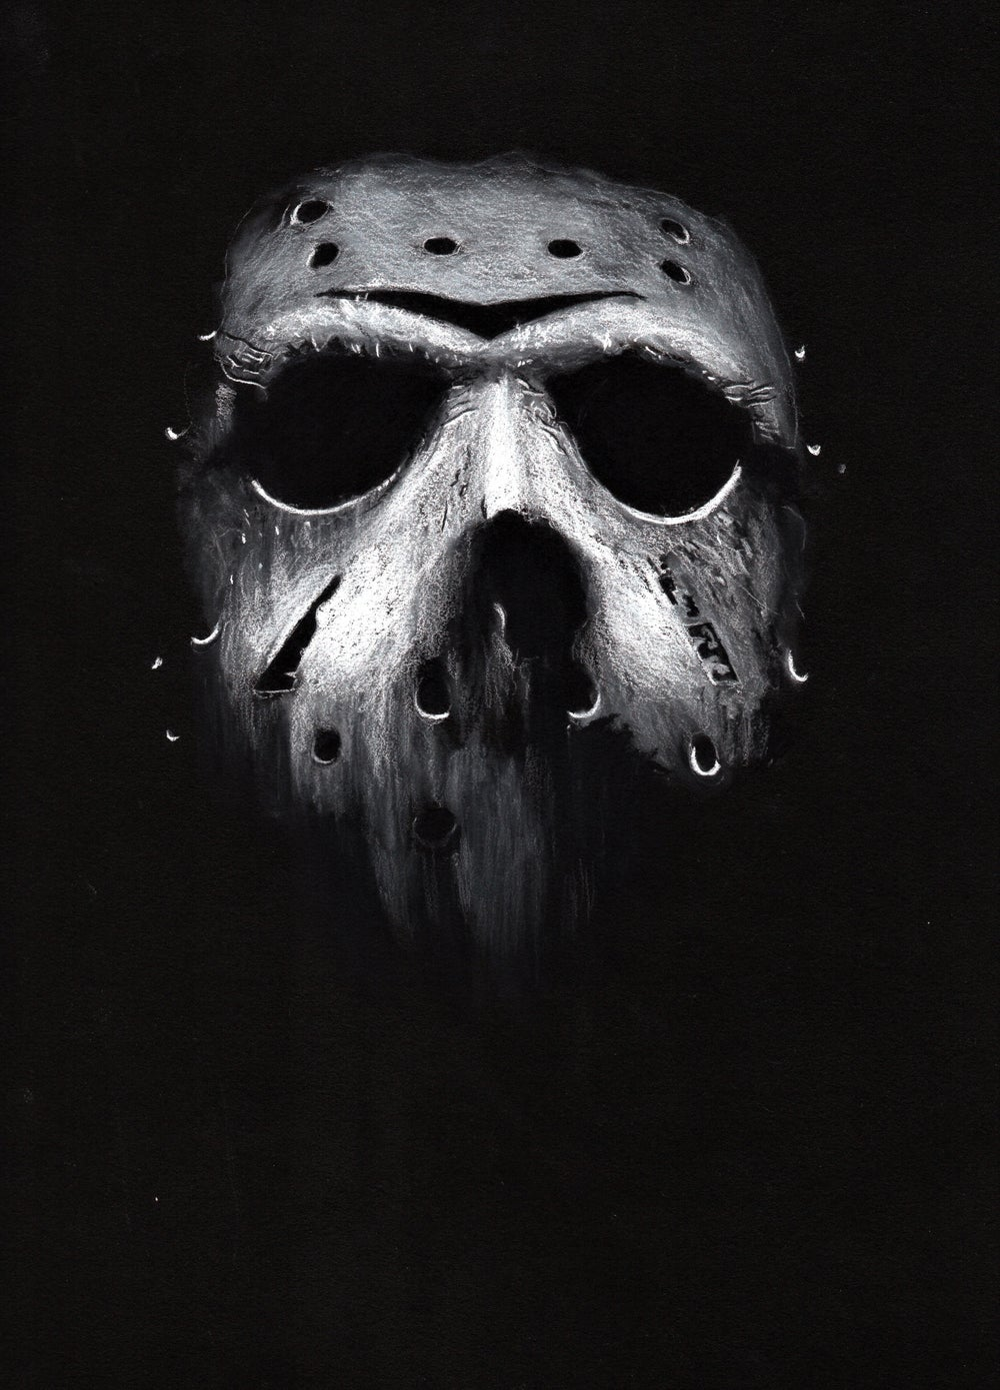 Jason 8x10 Print